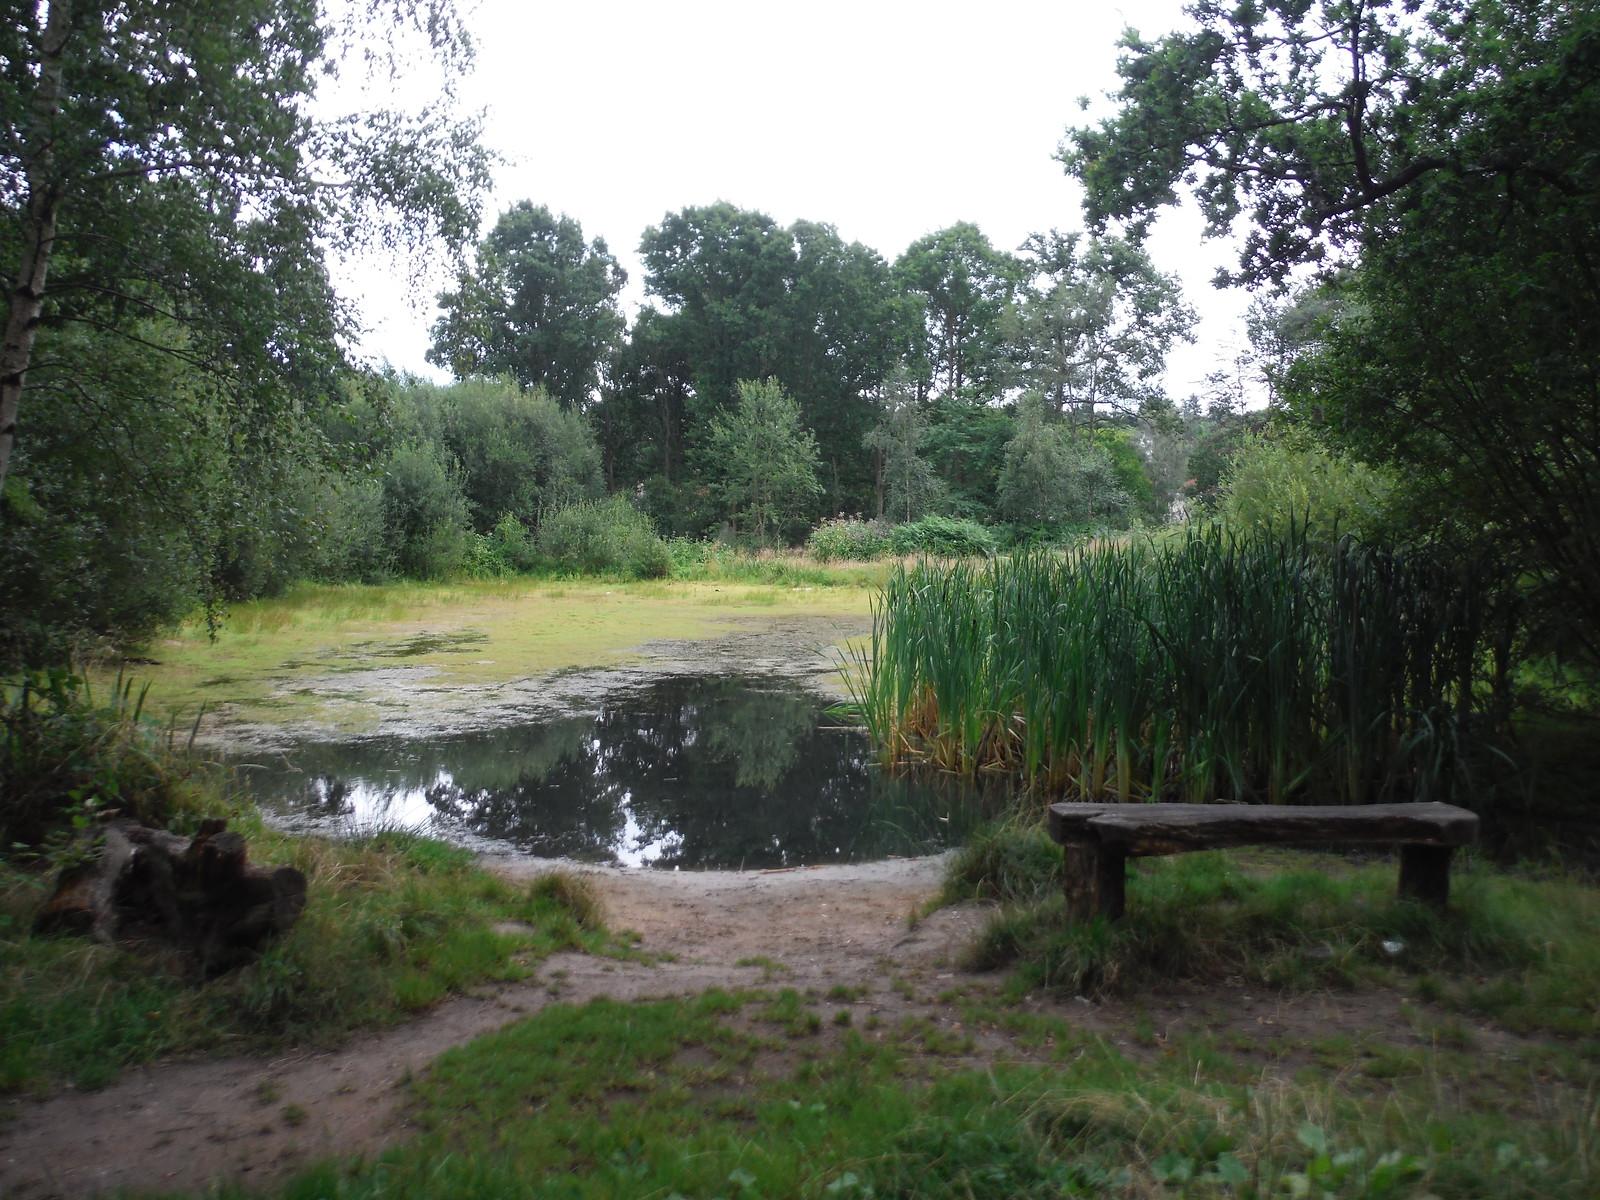 Halfpenny Pond, West End SWC Short Walk 17 - Oxshott Heath, Esher and West End Commons